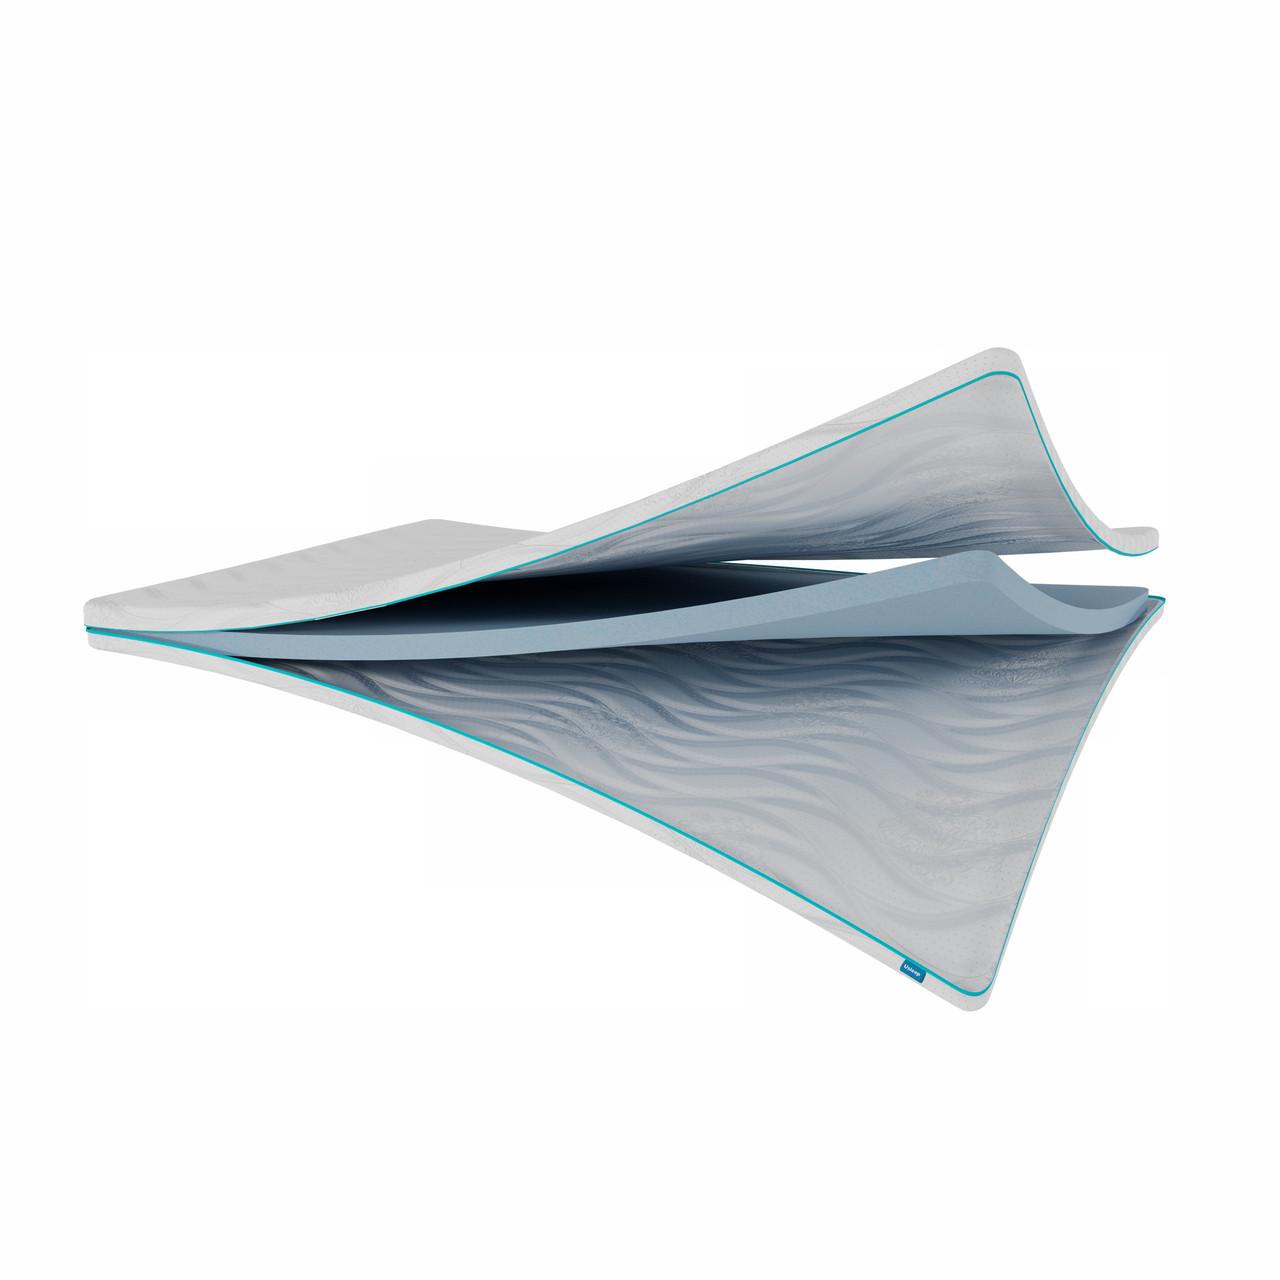 Тонкий матрац топпер-футон SleepRoll Mint Usleep 160х190